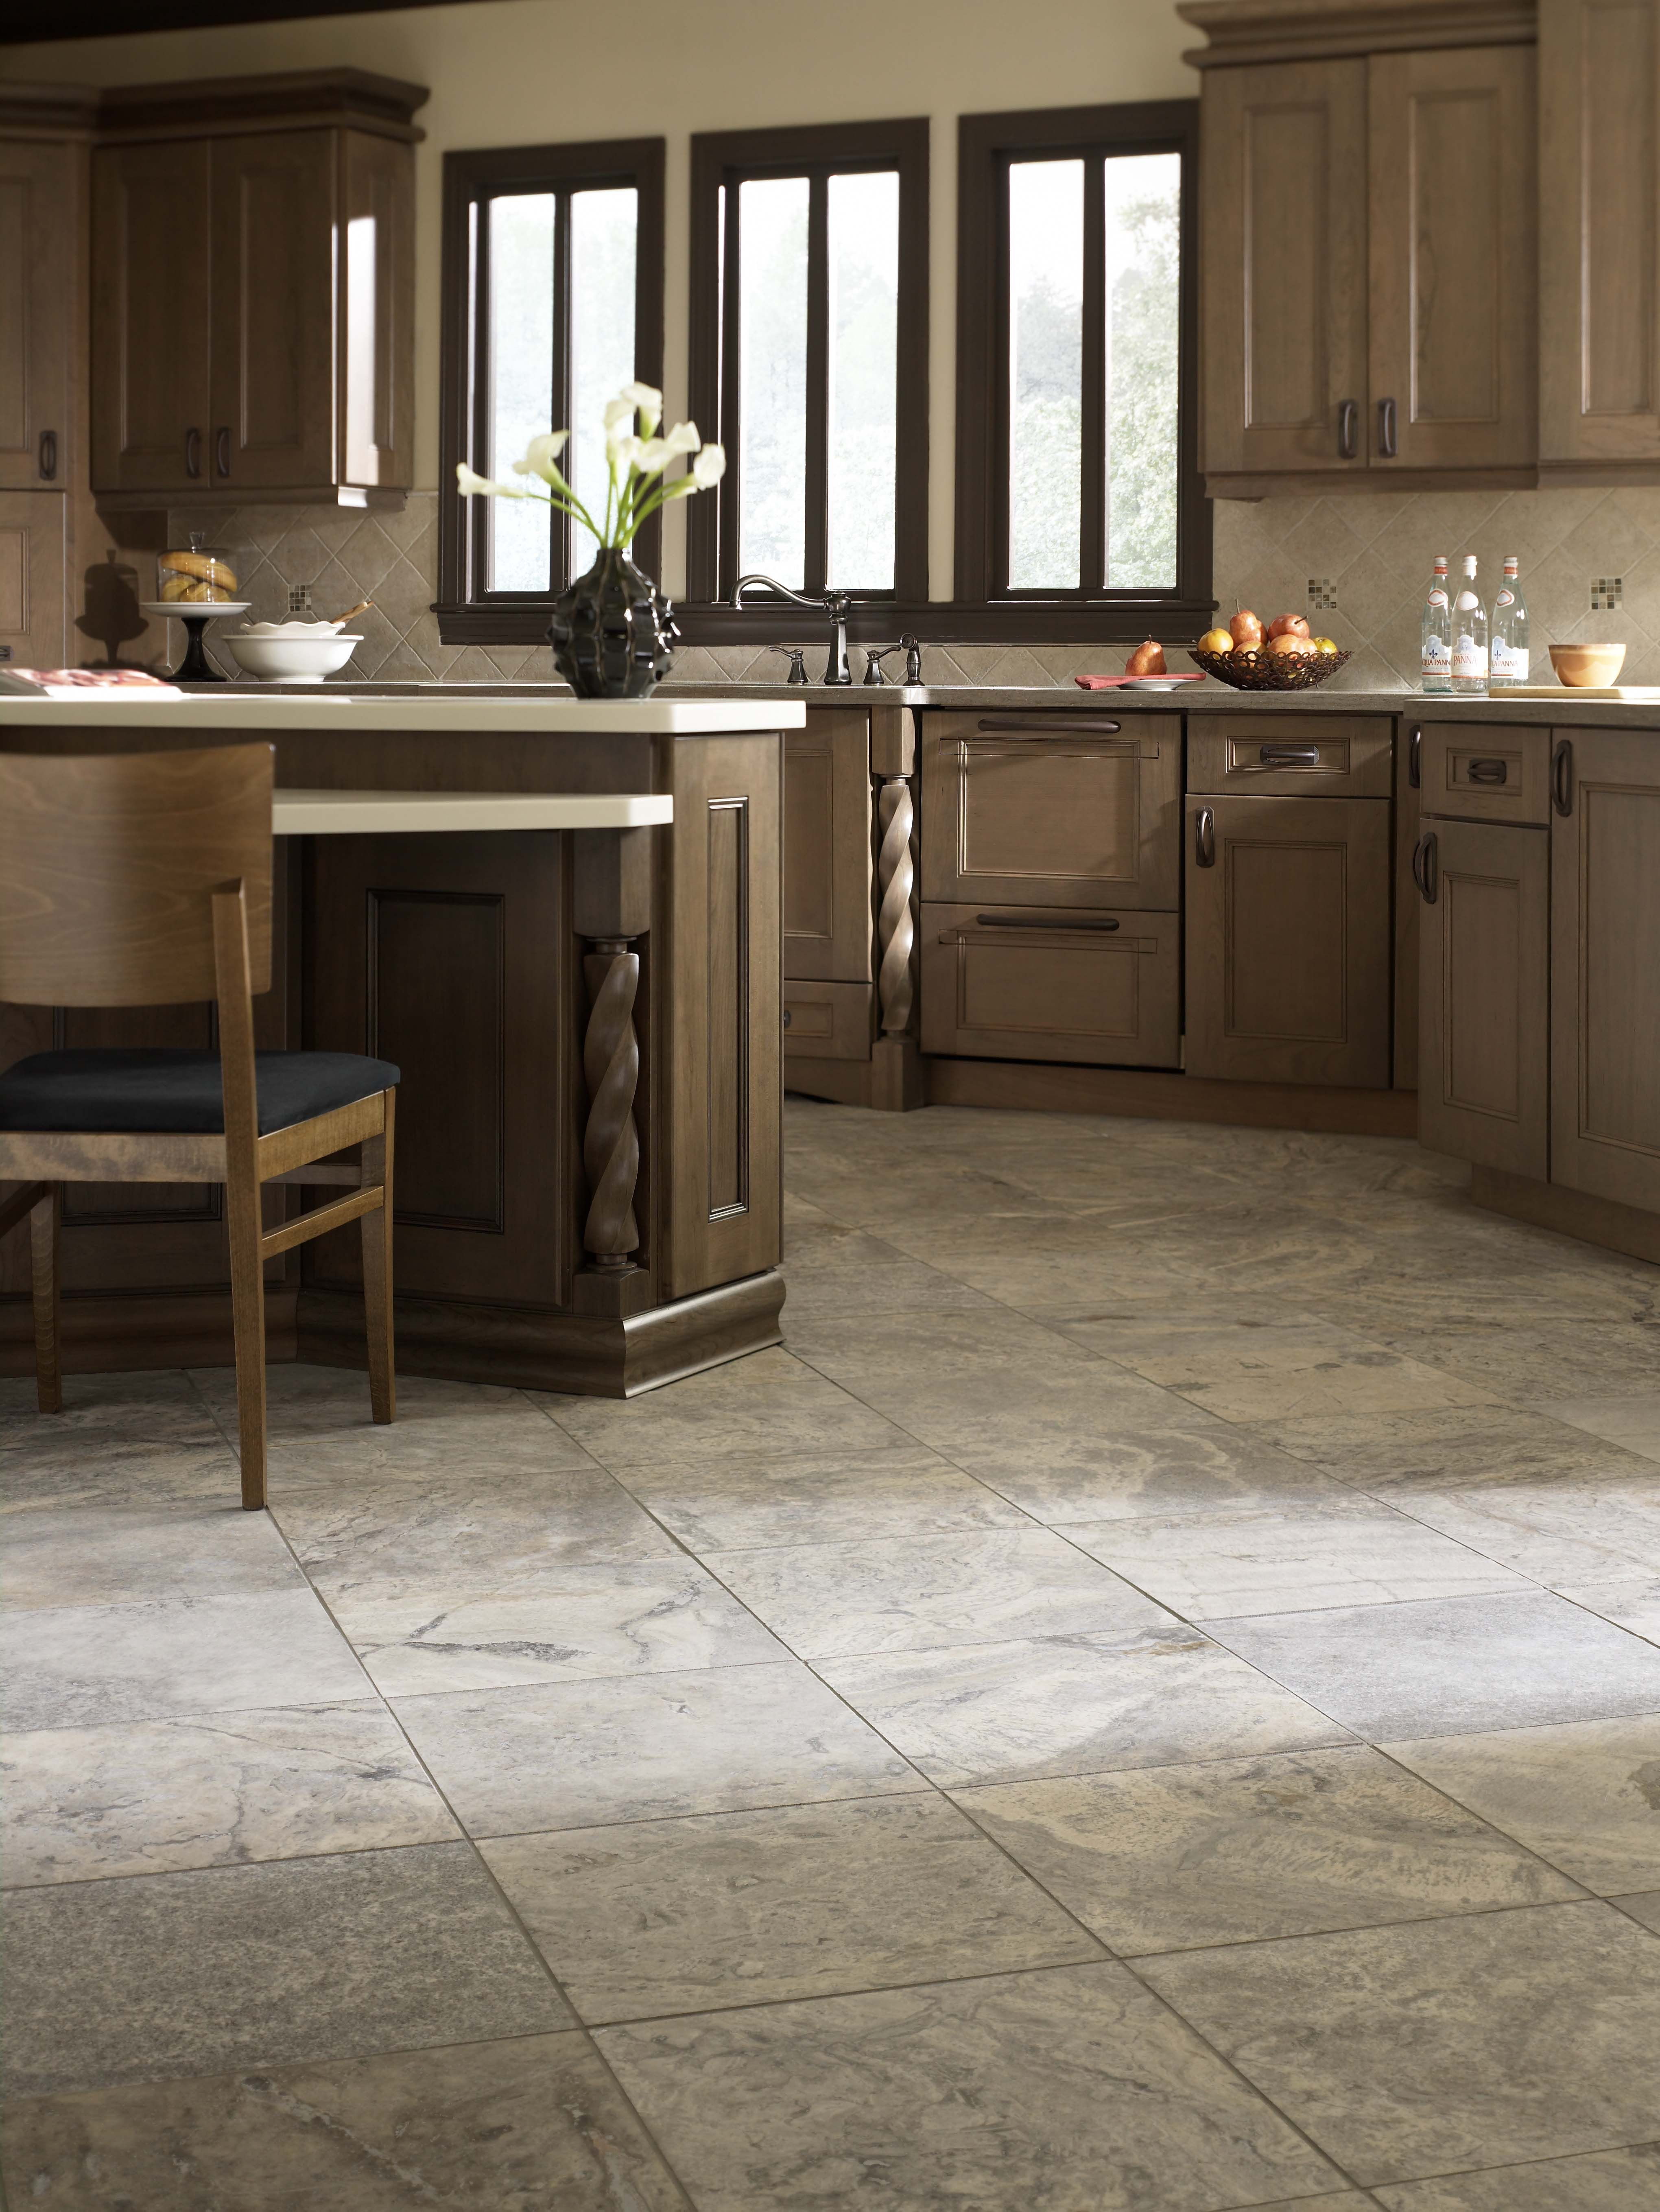 Travertine From Florida Tile Kitchen Flooring Floor Tile Design